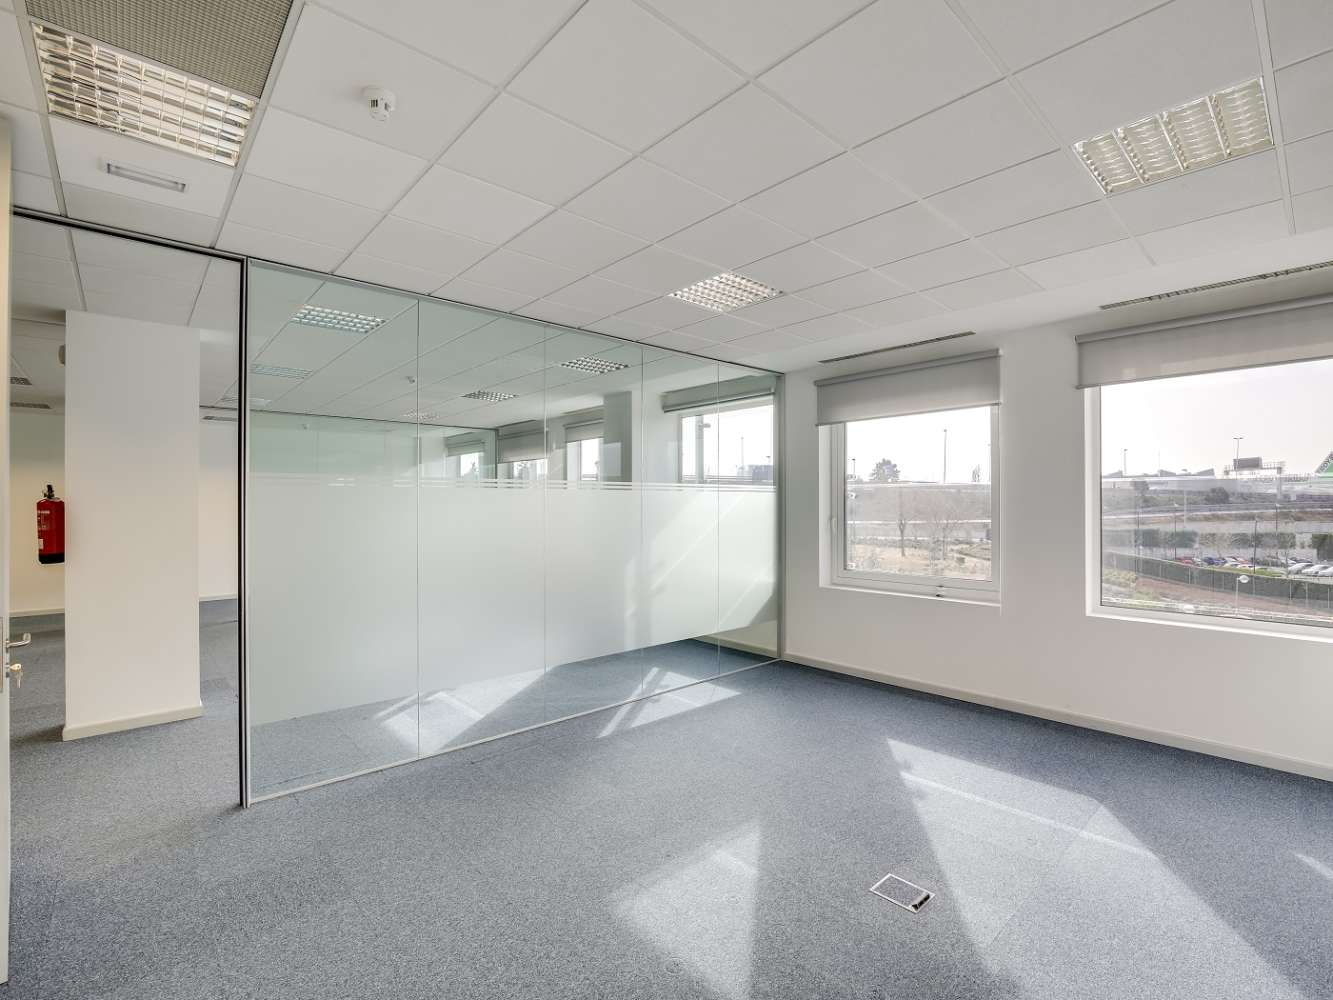 Oficina Las rozas de madrid, 28232 - Edificio 3. P.E. Alvia - 14370